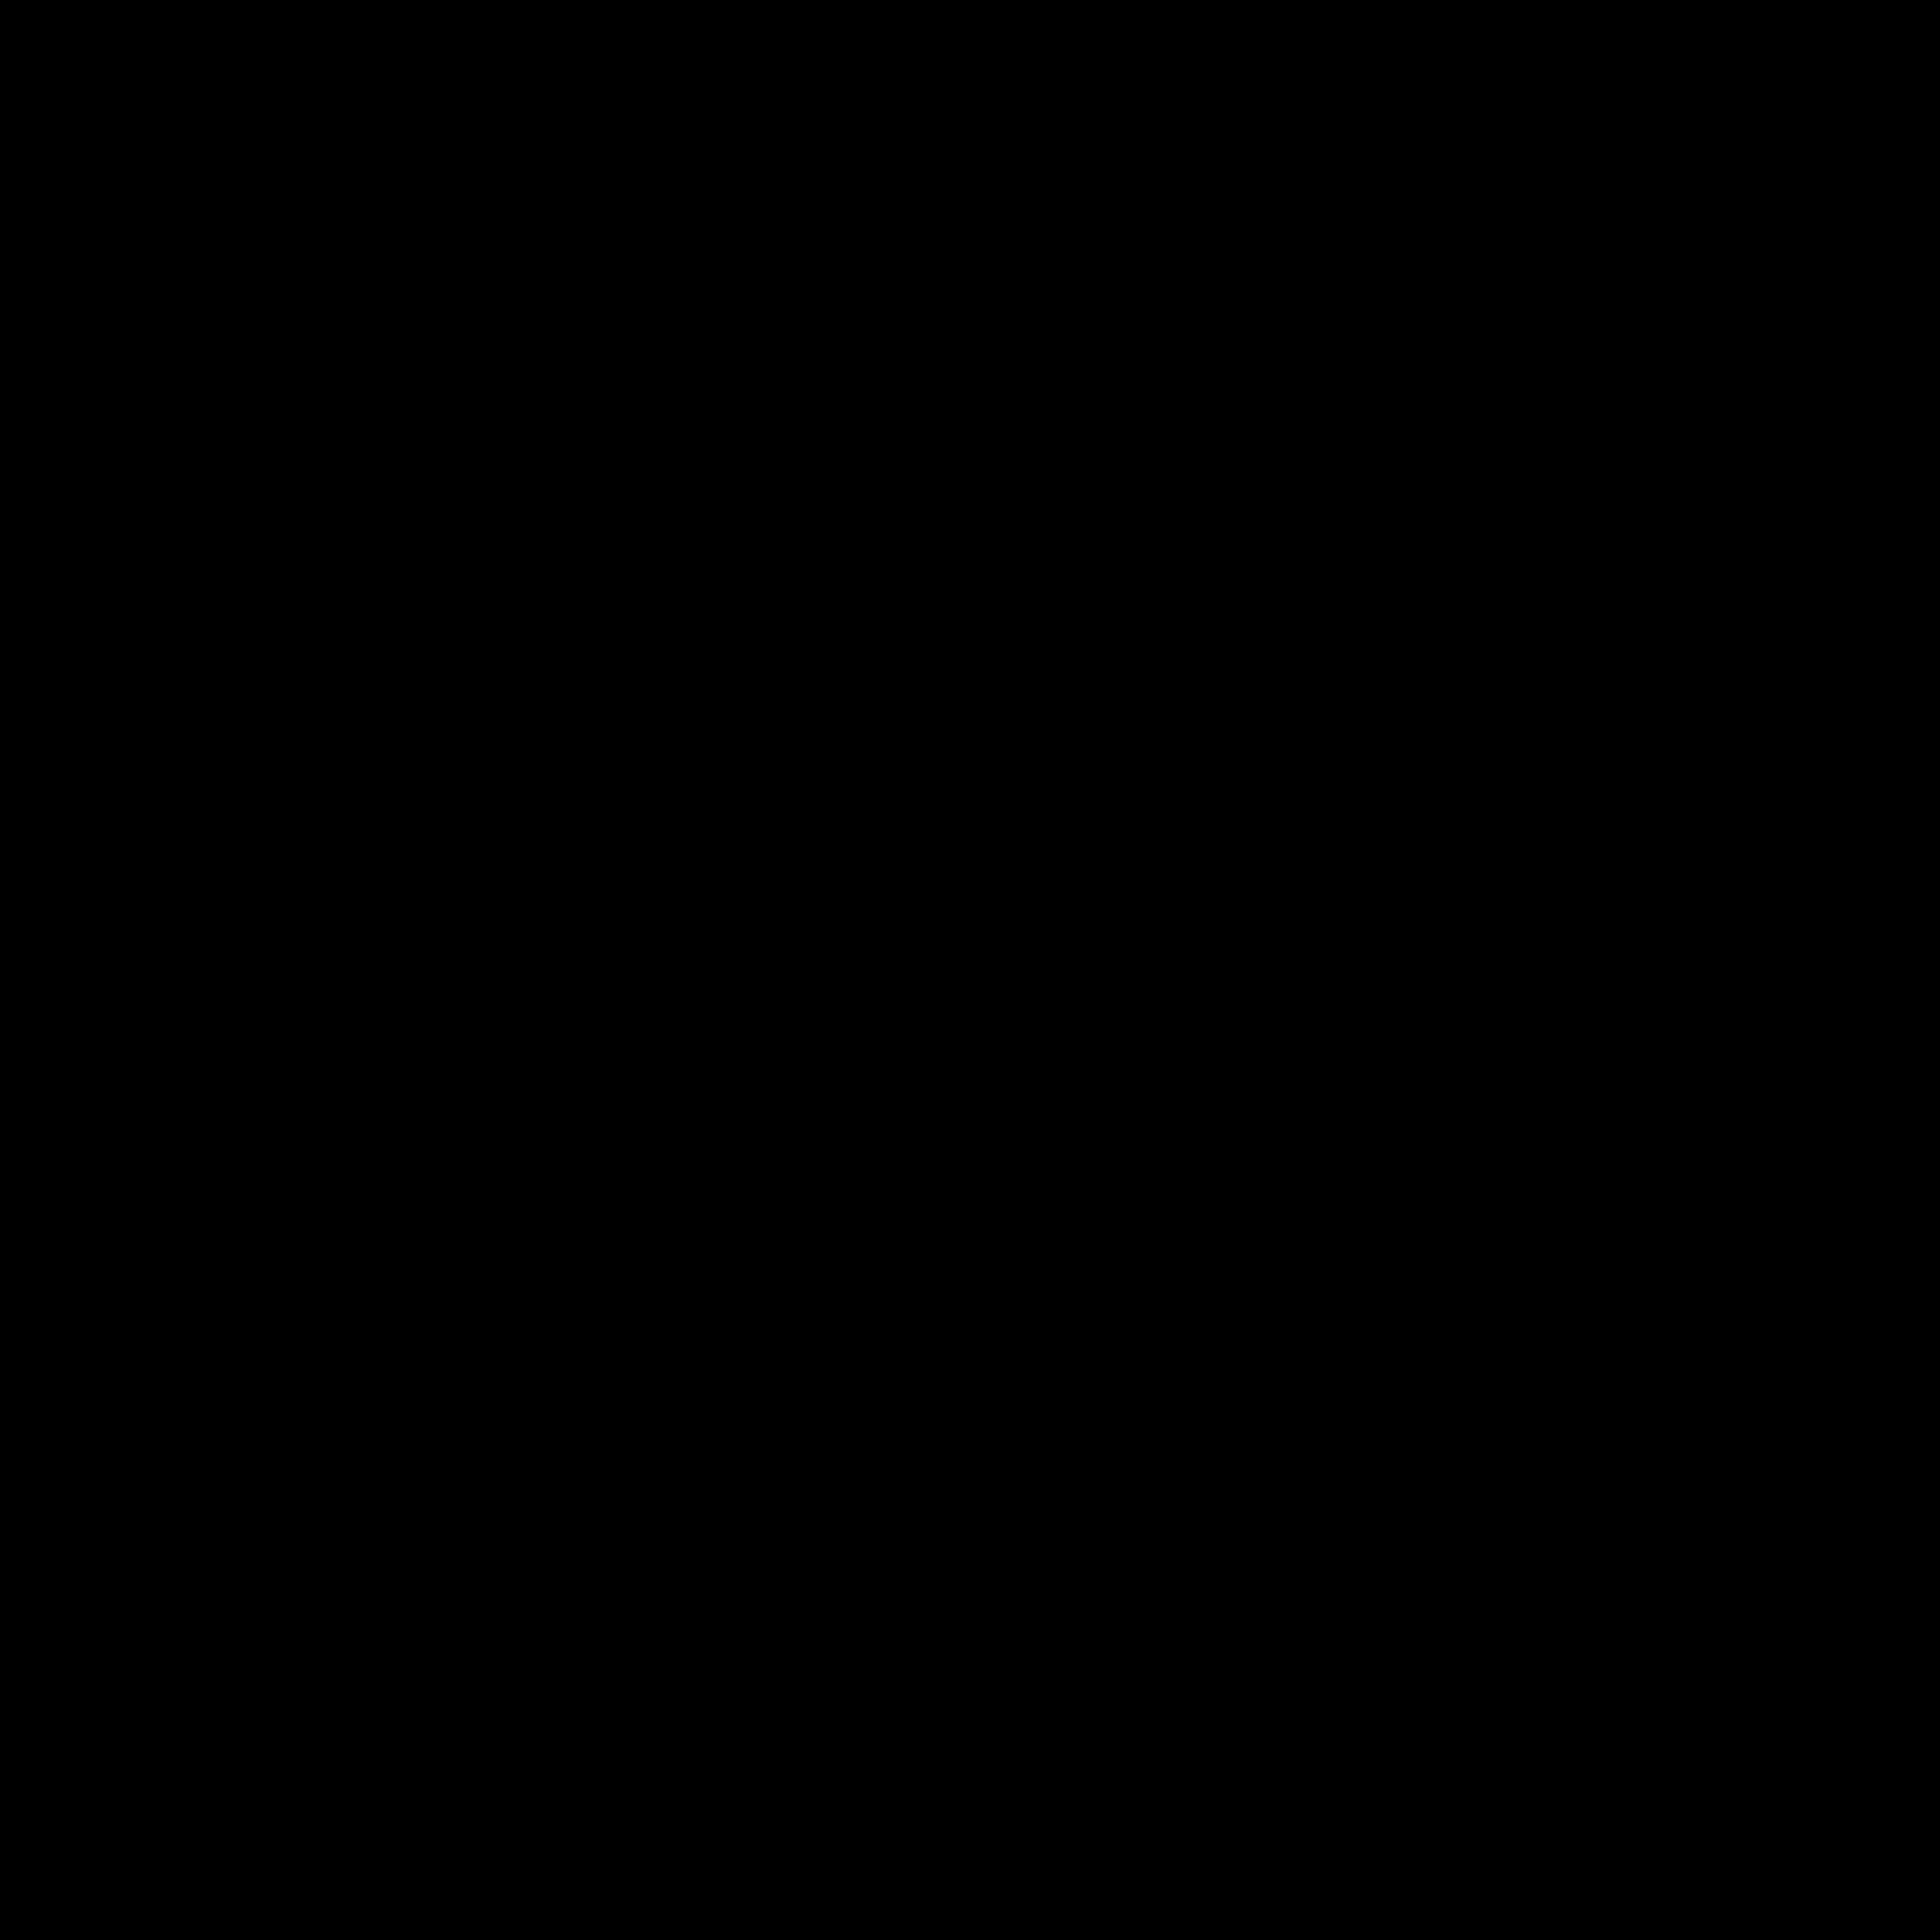 Yeti Logo PNG Transparent & SVG Vector.